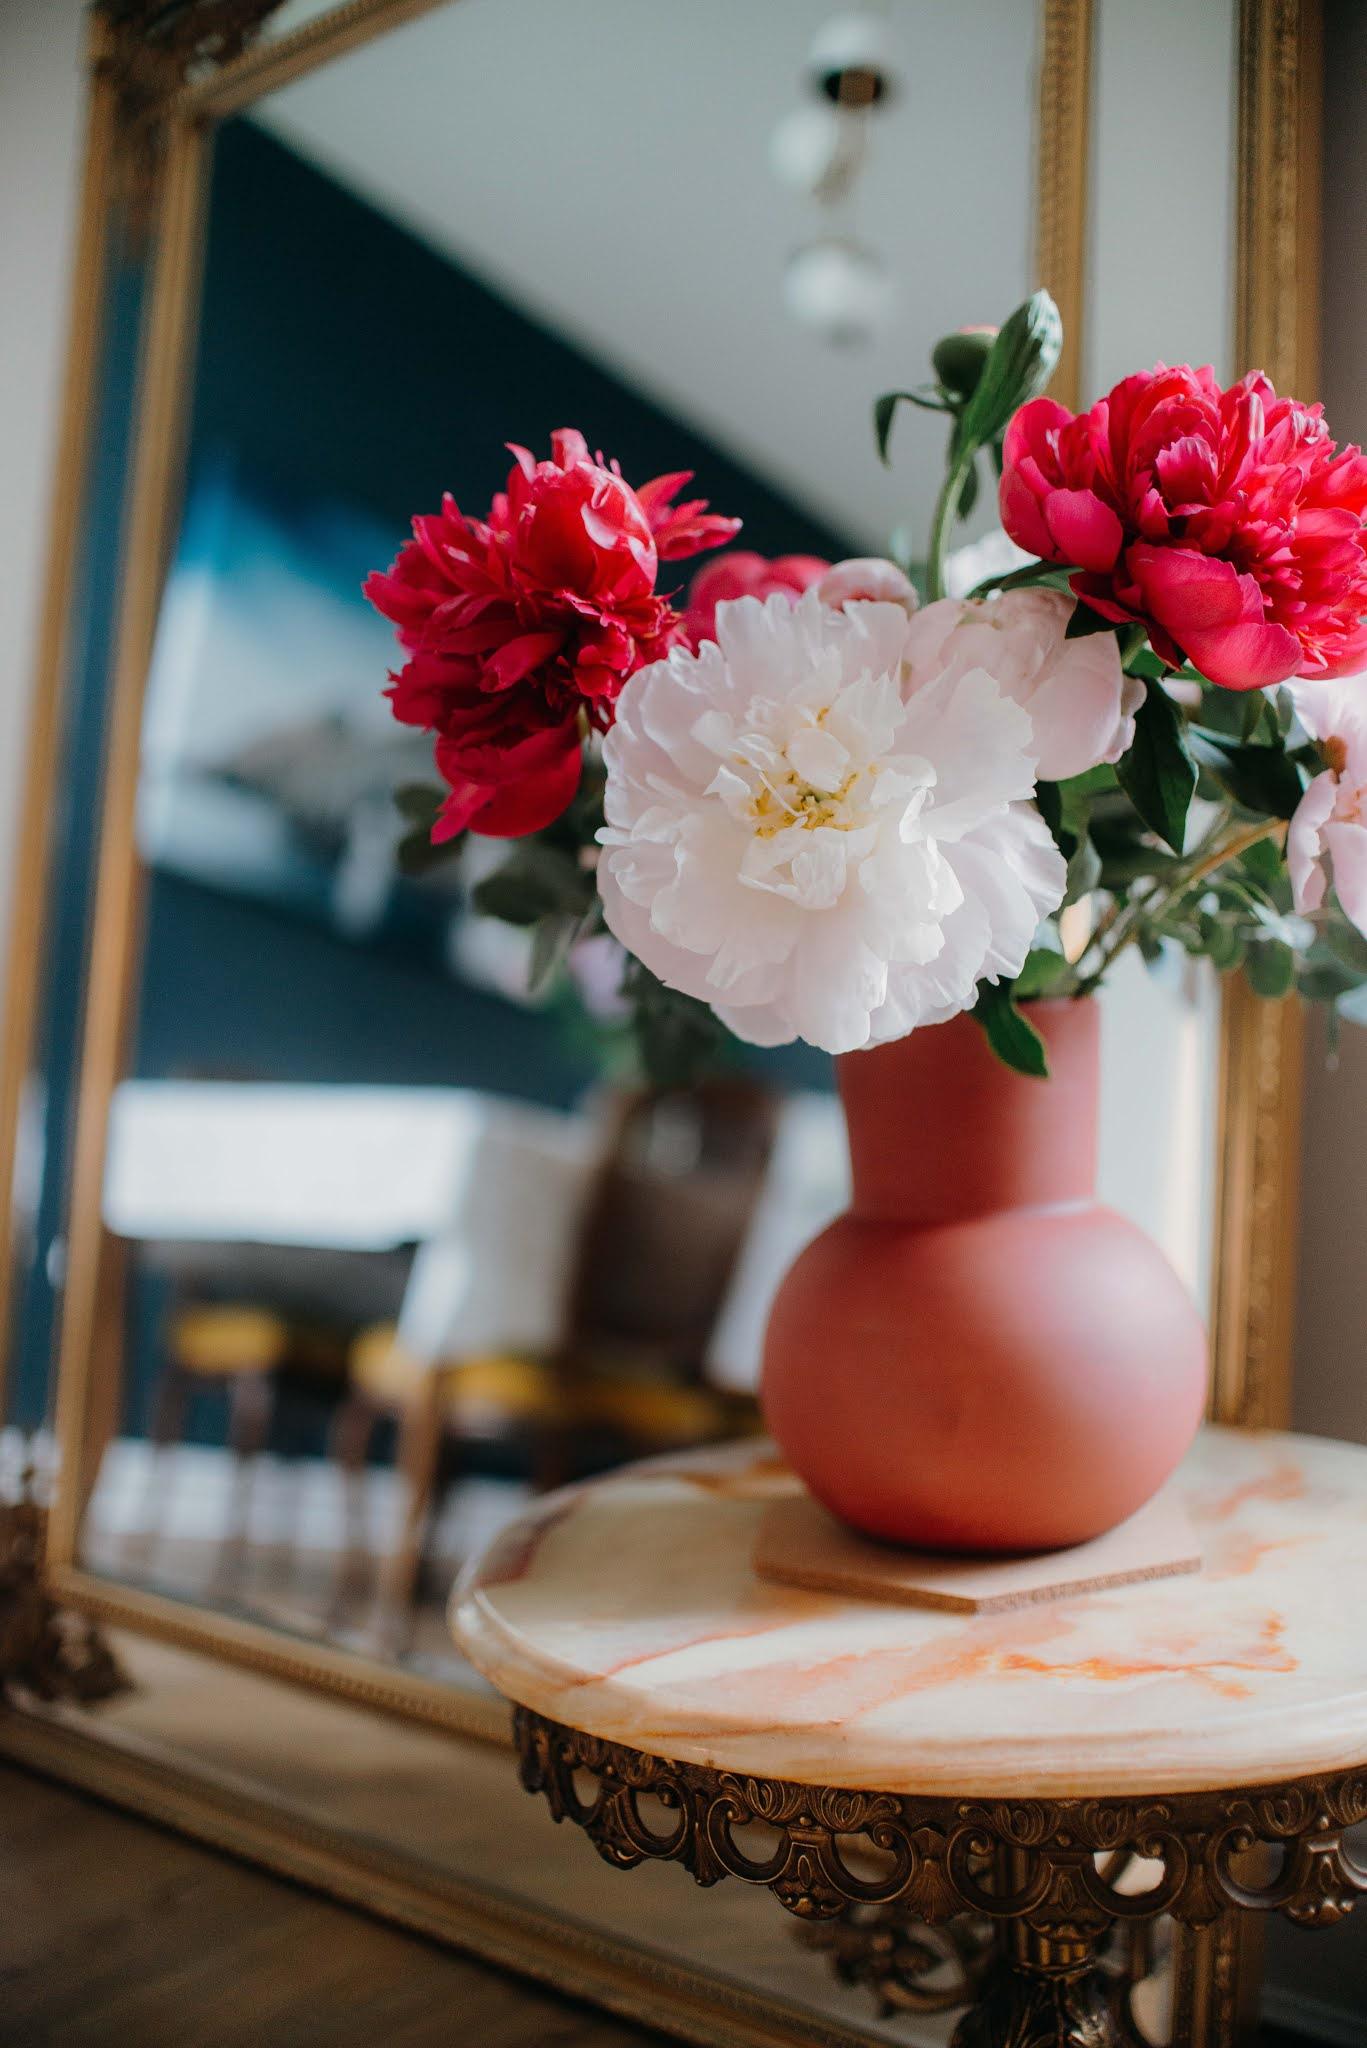 peonies arena flowers discount subscription liquid grain